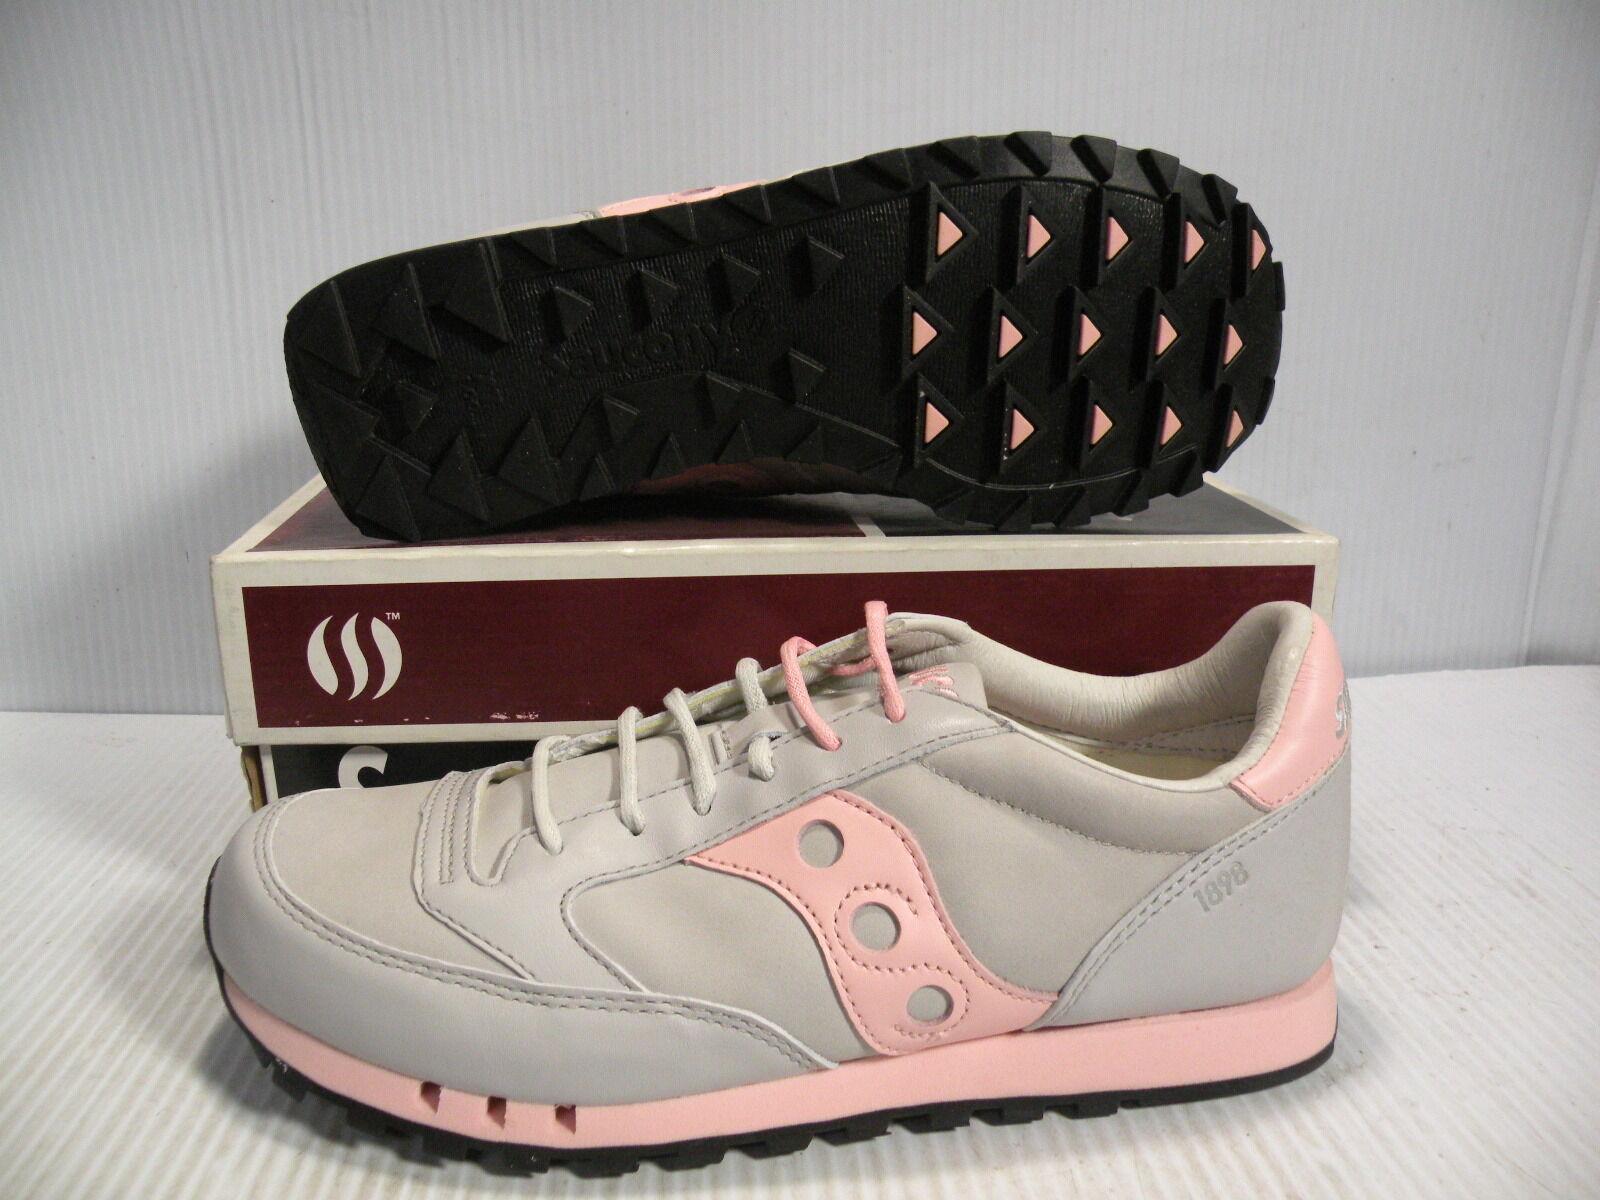 SAUCONY JAZZ NUBUCK LOW SUEDE SNEAKER WOMEN Schuhe GREY/PINK 1497-10 SIZE 8.5 NEU